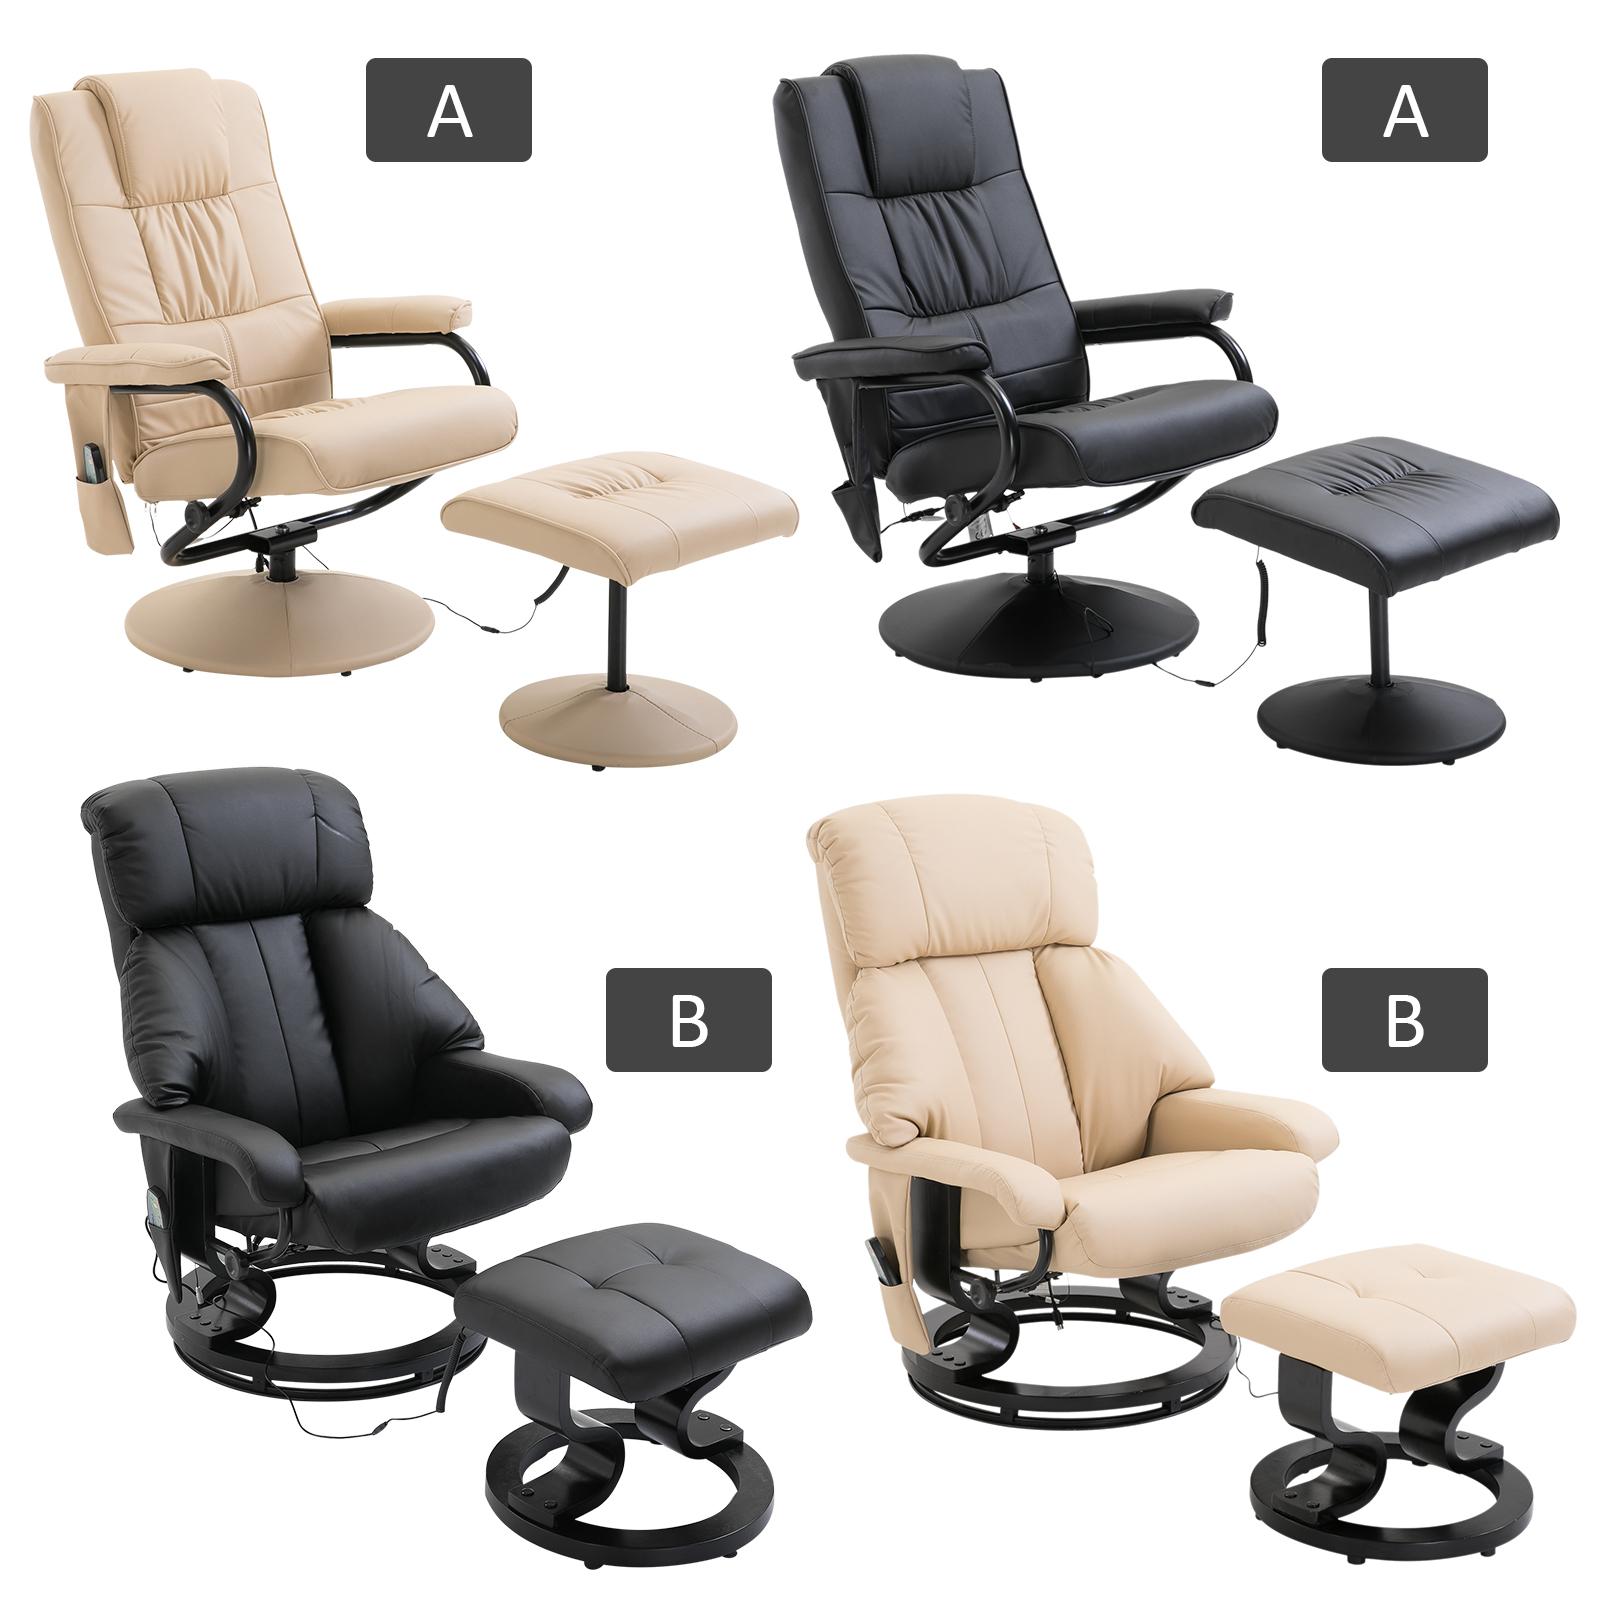 Recliner Massage Chair Arm Chair Armchair Stool 10 Point Massage Heat Function Ebay